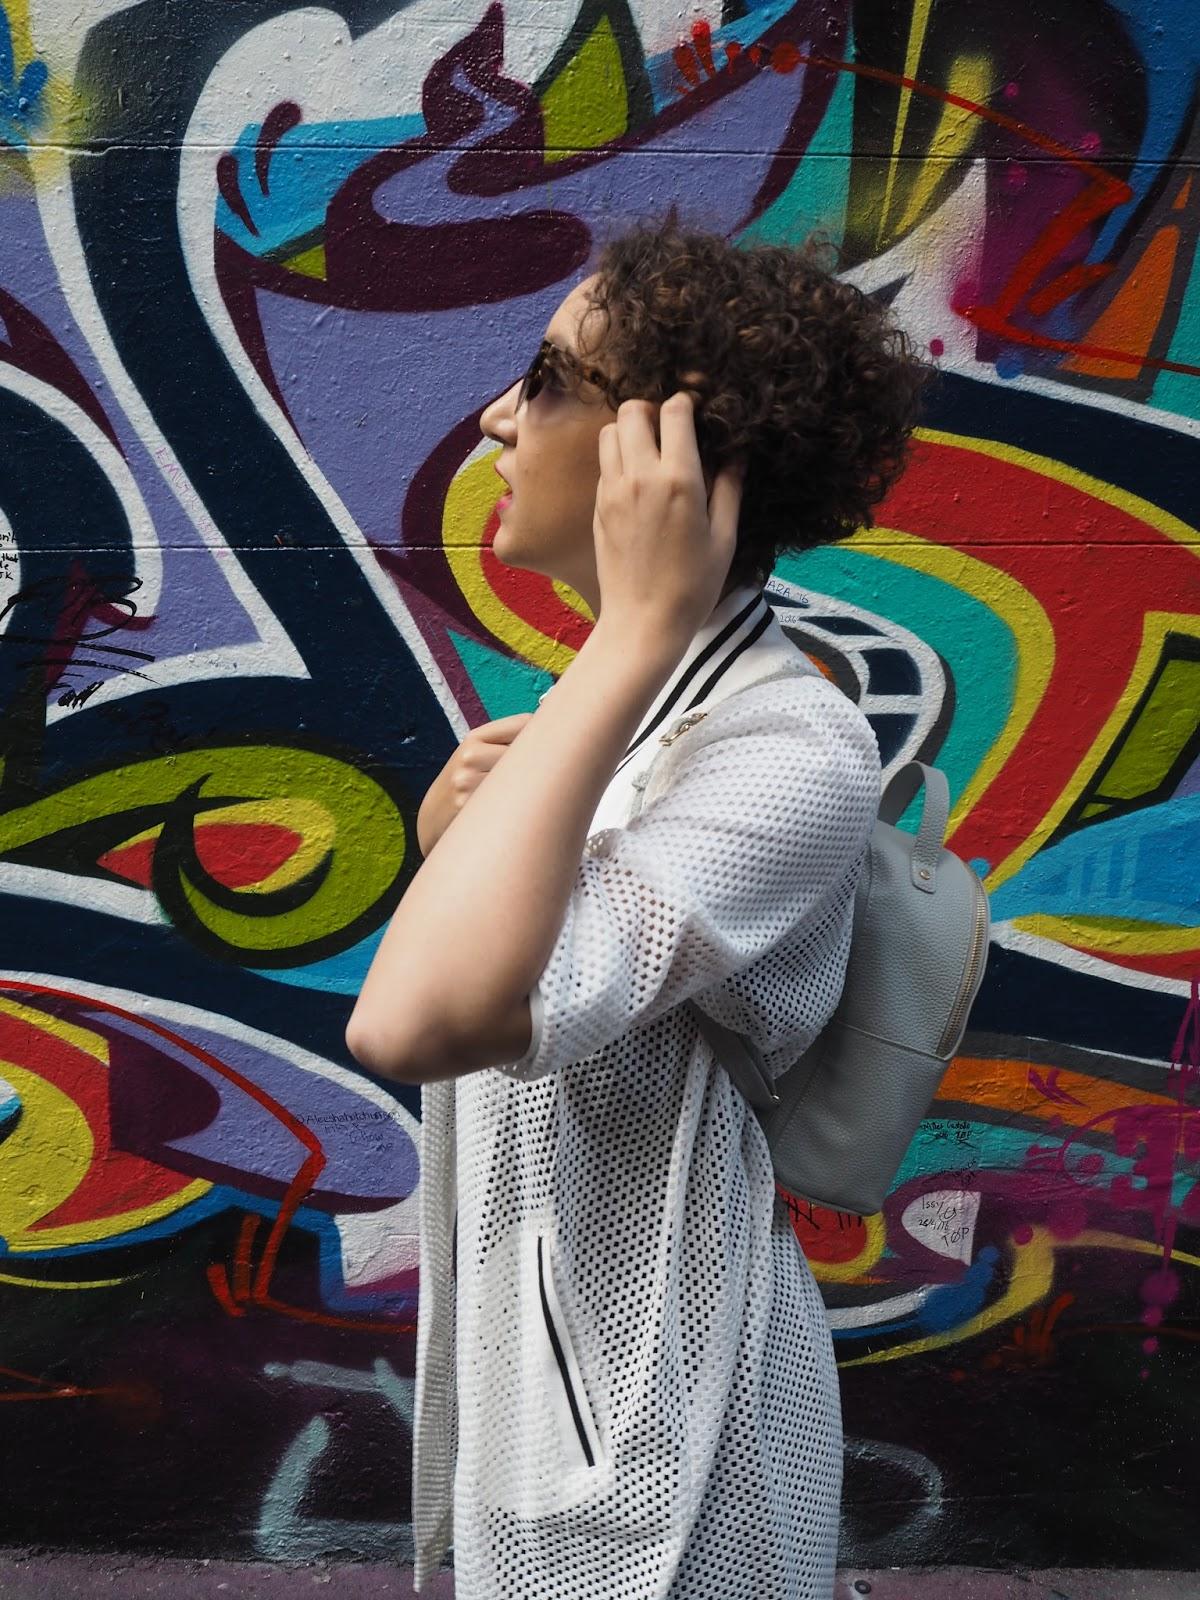 Monochrome outfit on Melbourne's Hosier Lane